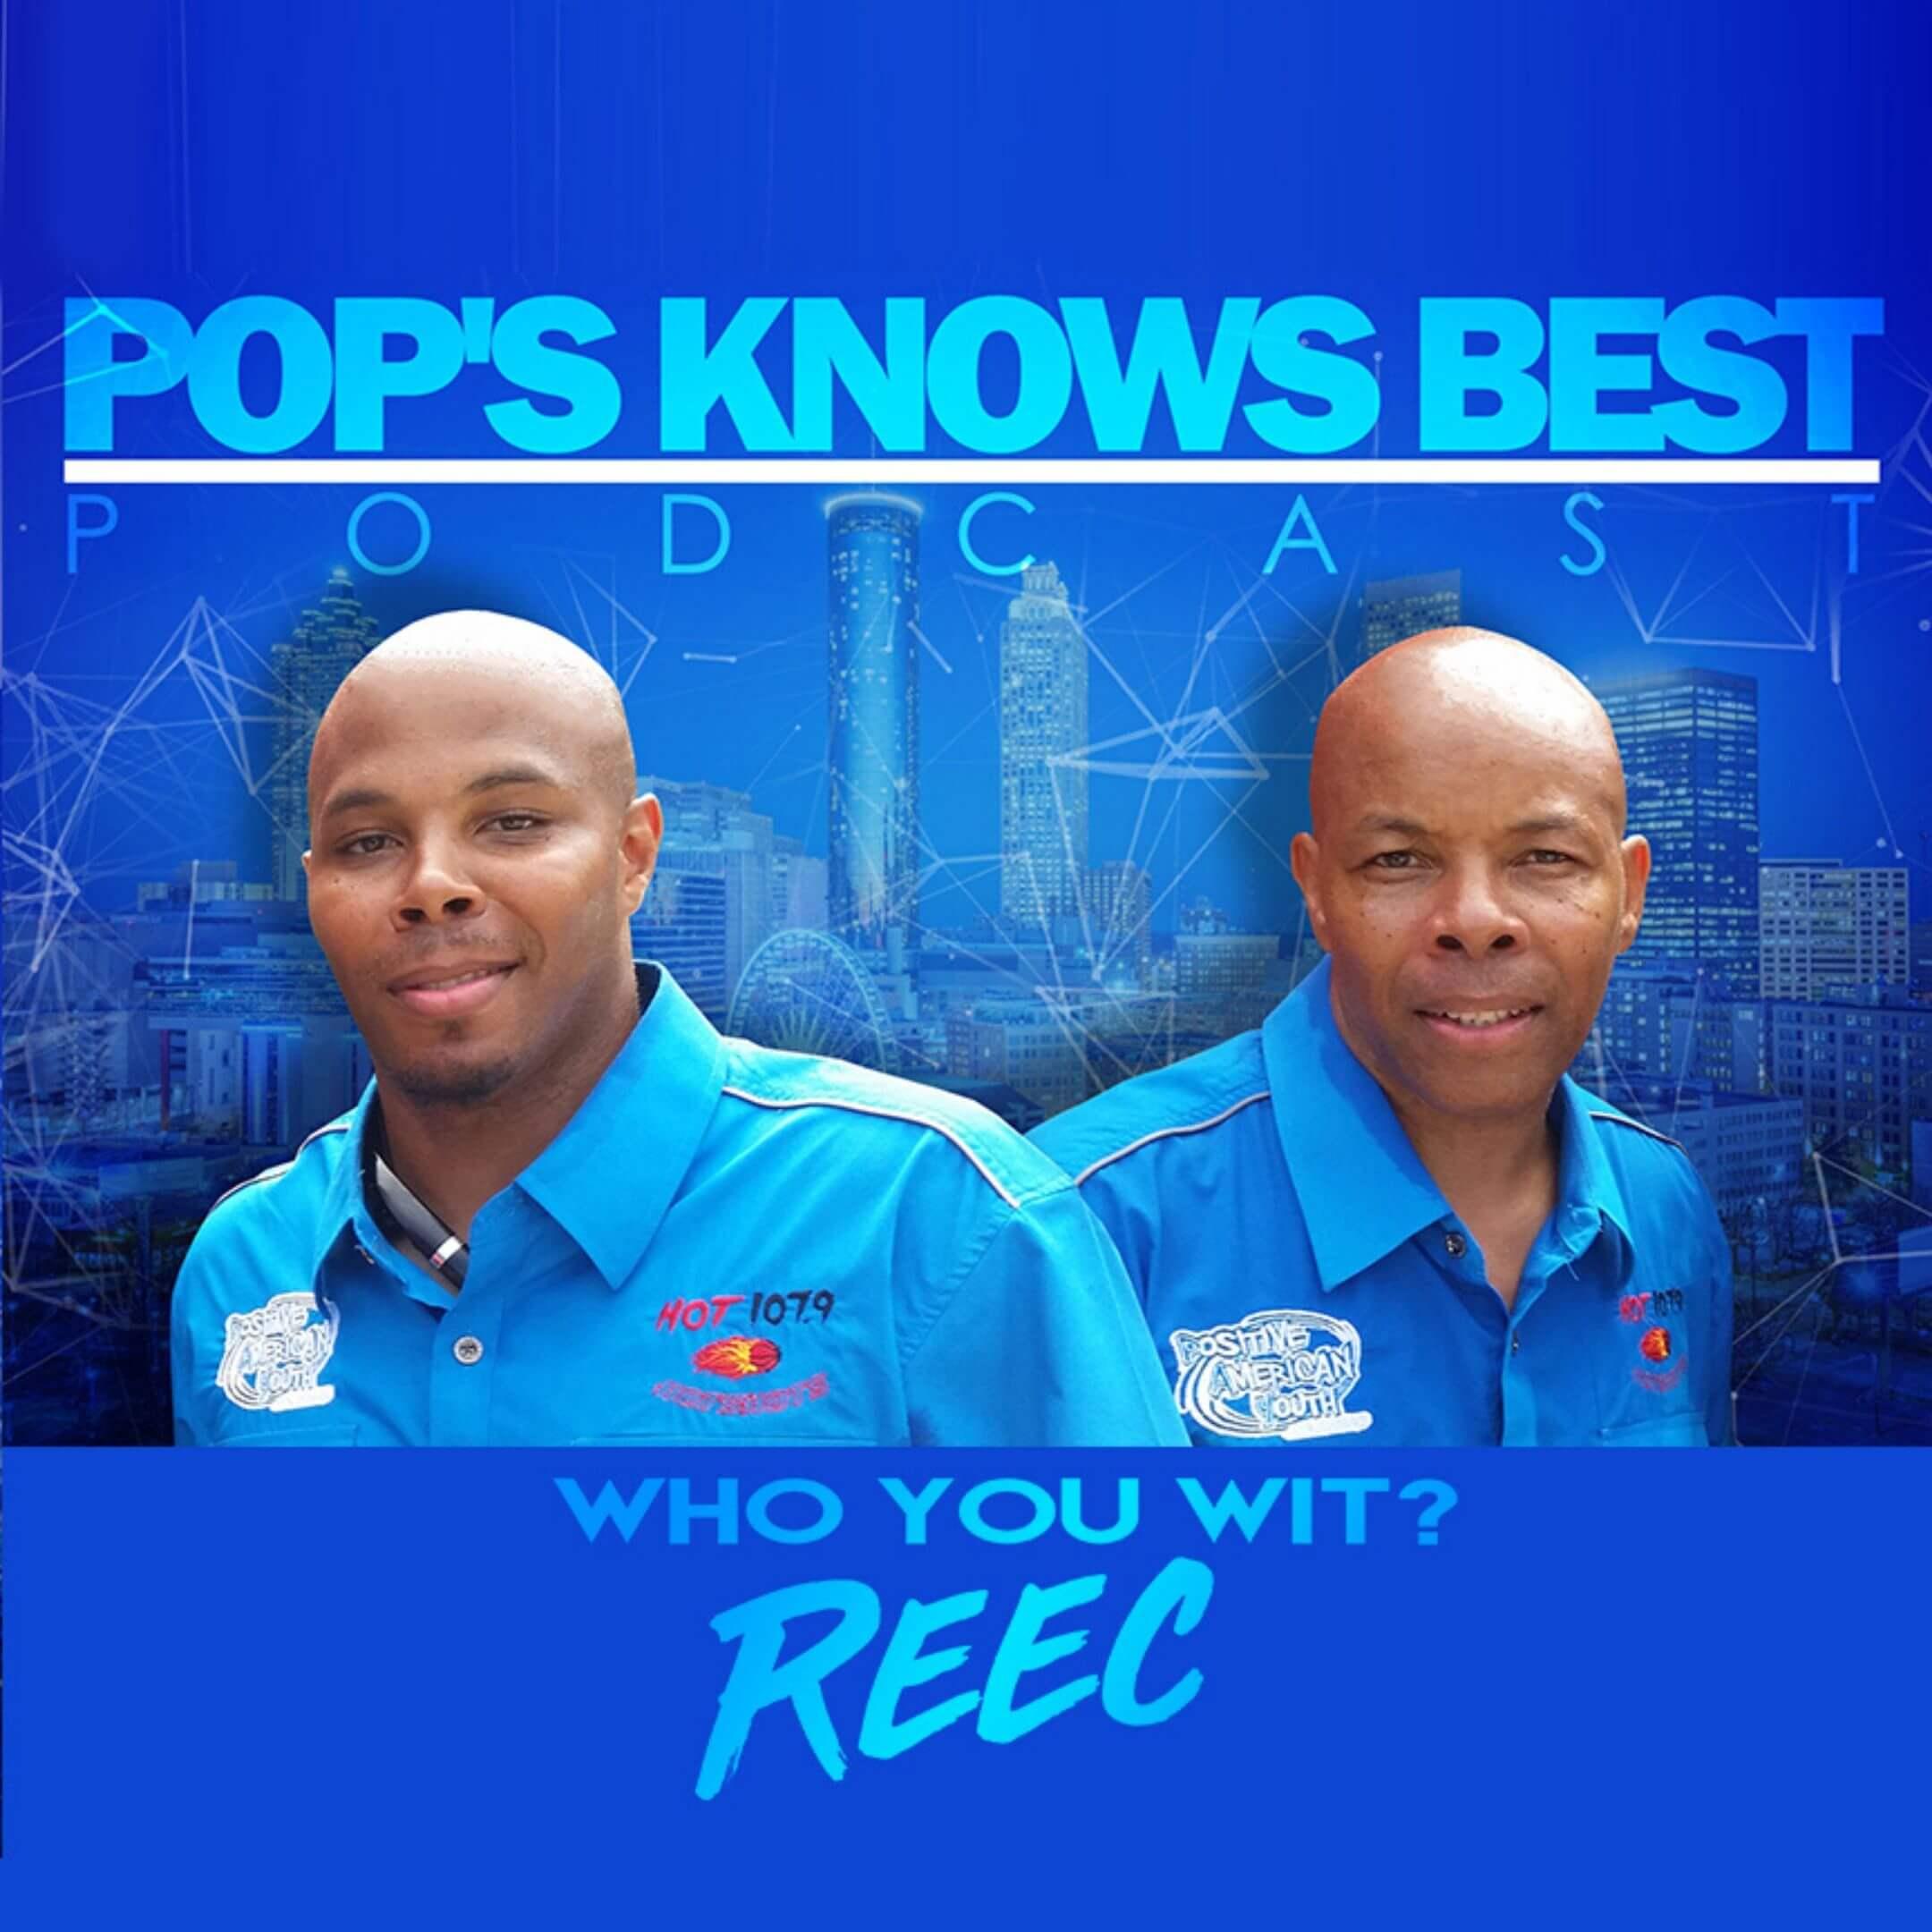 Reec Pops Knows Best web graphic